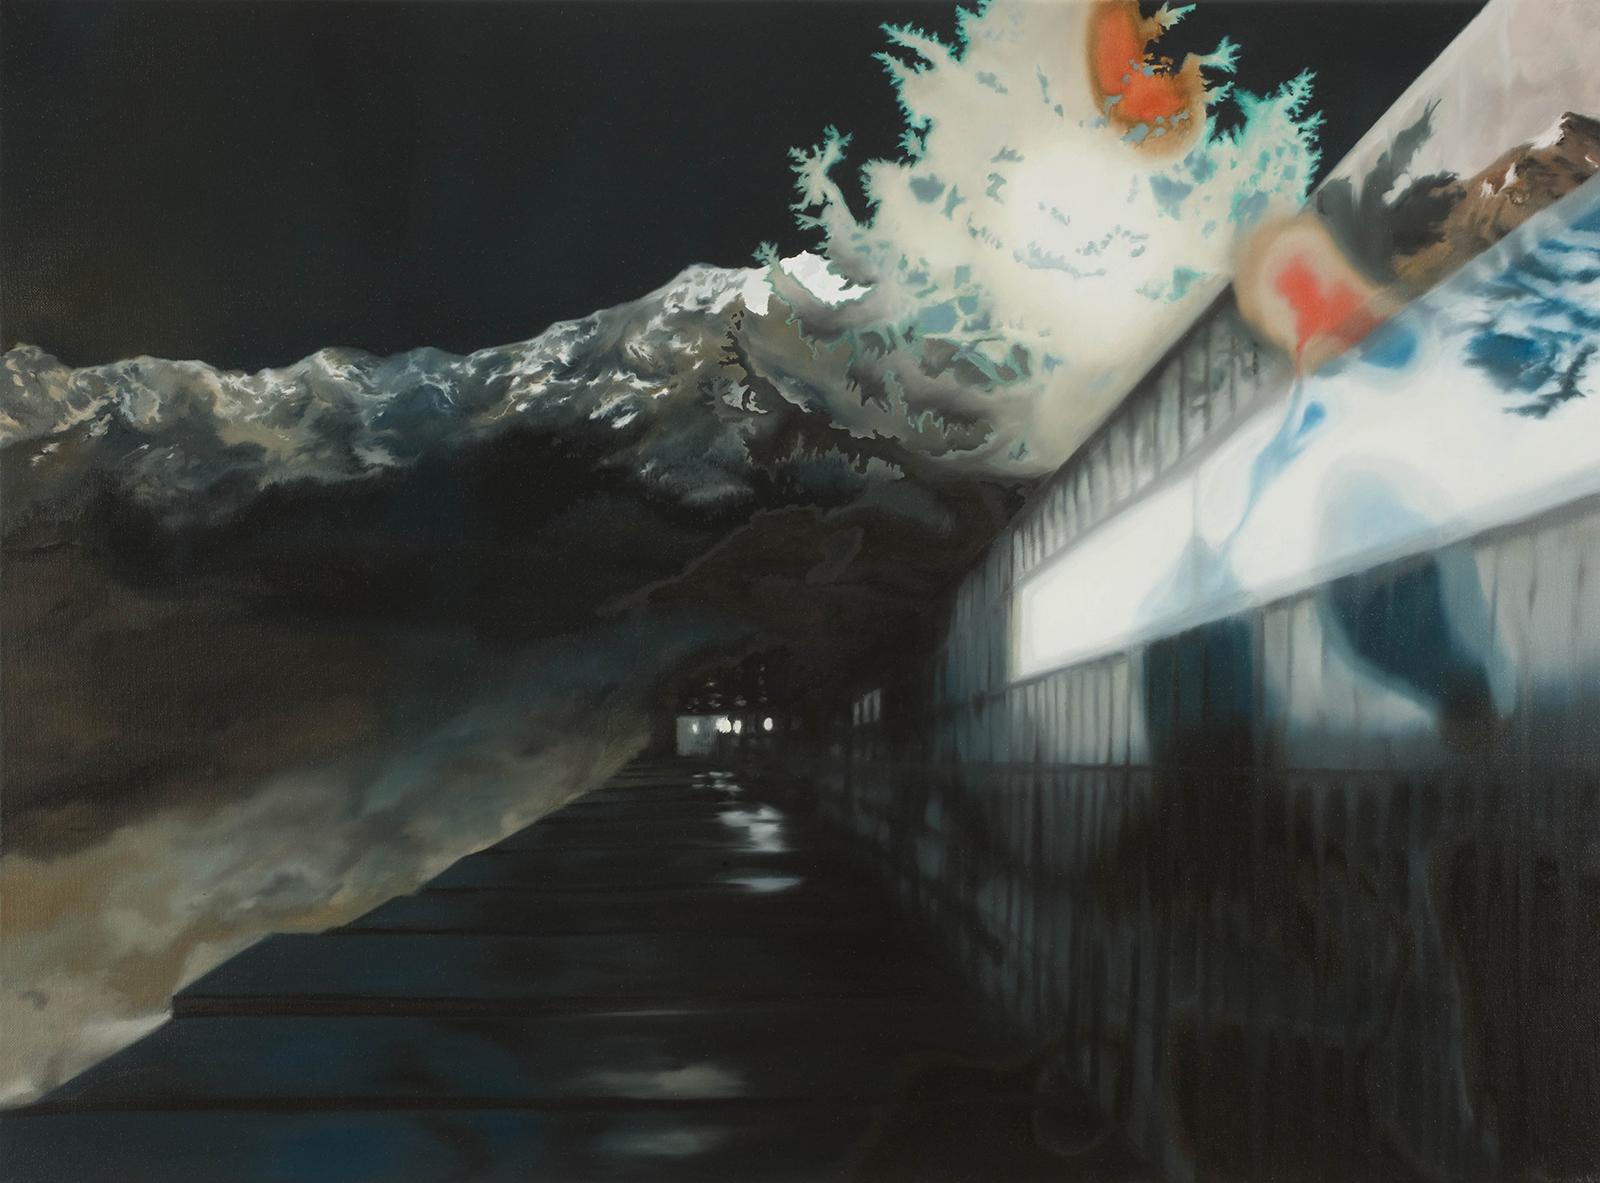 Nachtfahrt 2008, 62 x 83 cm, Öl auf Leinwand, Night Trip 2009